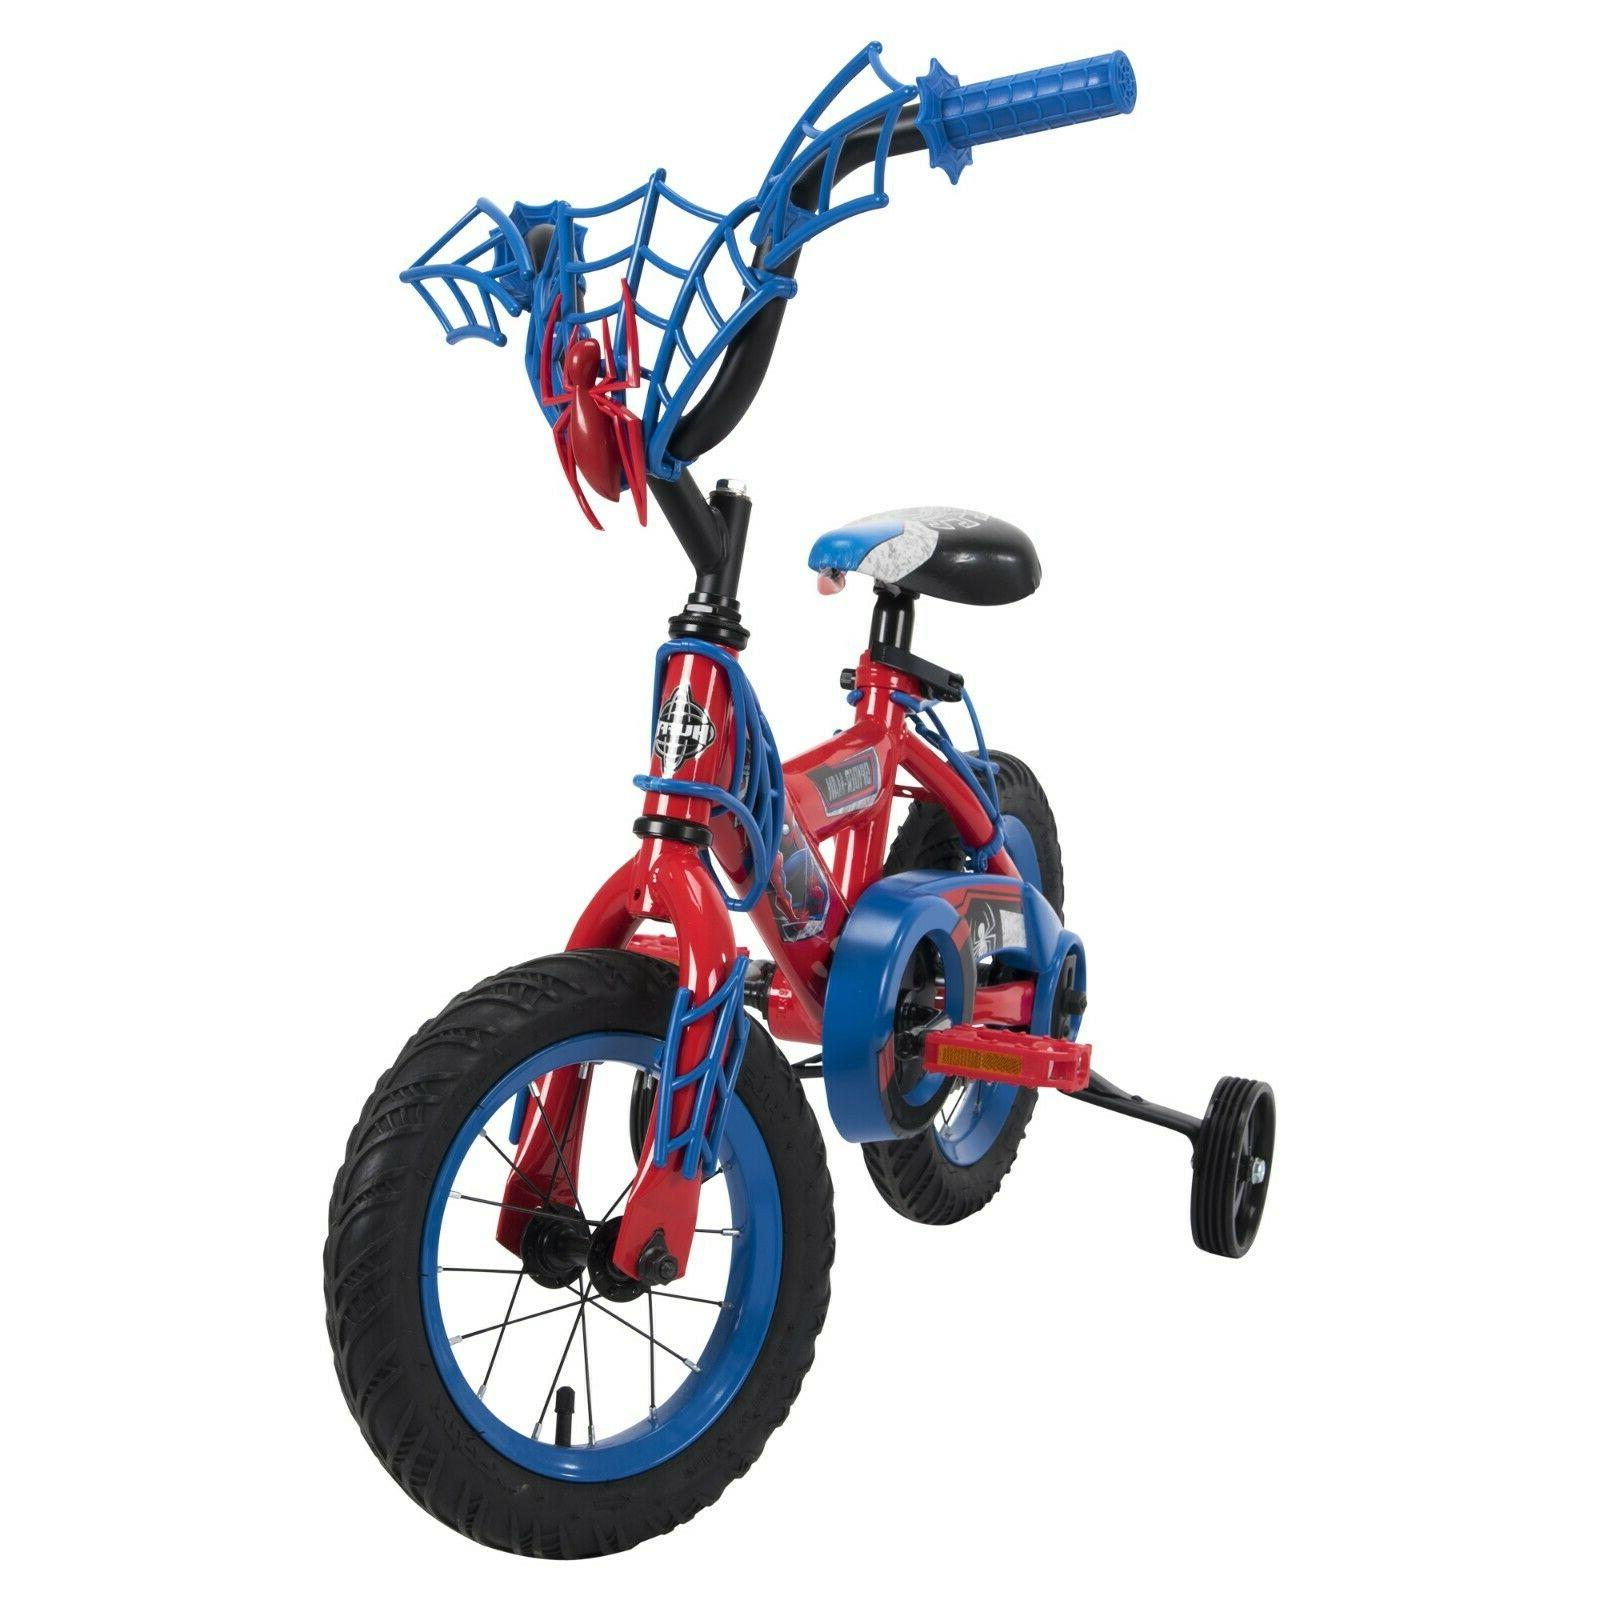 Huffy Kid's Bike Plaque